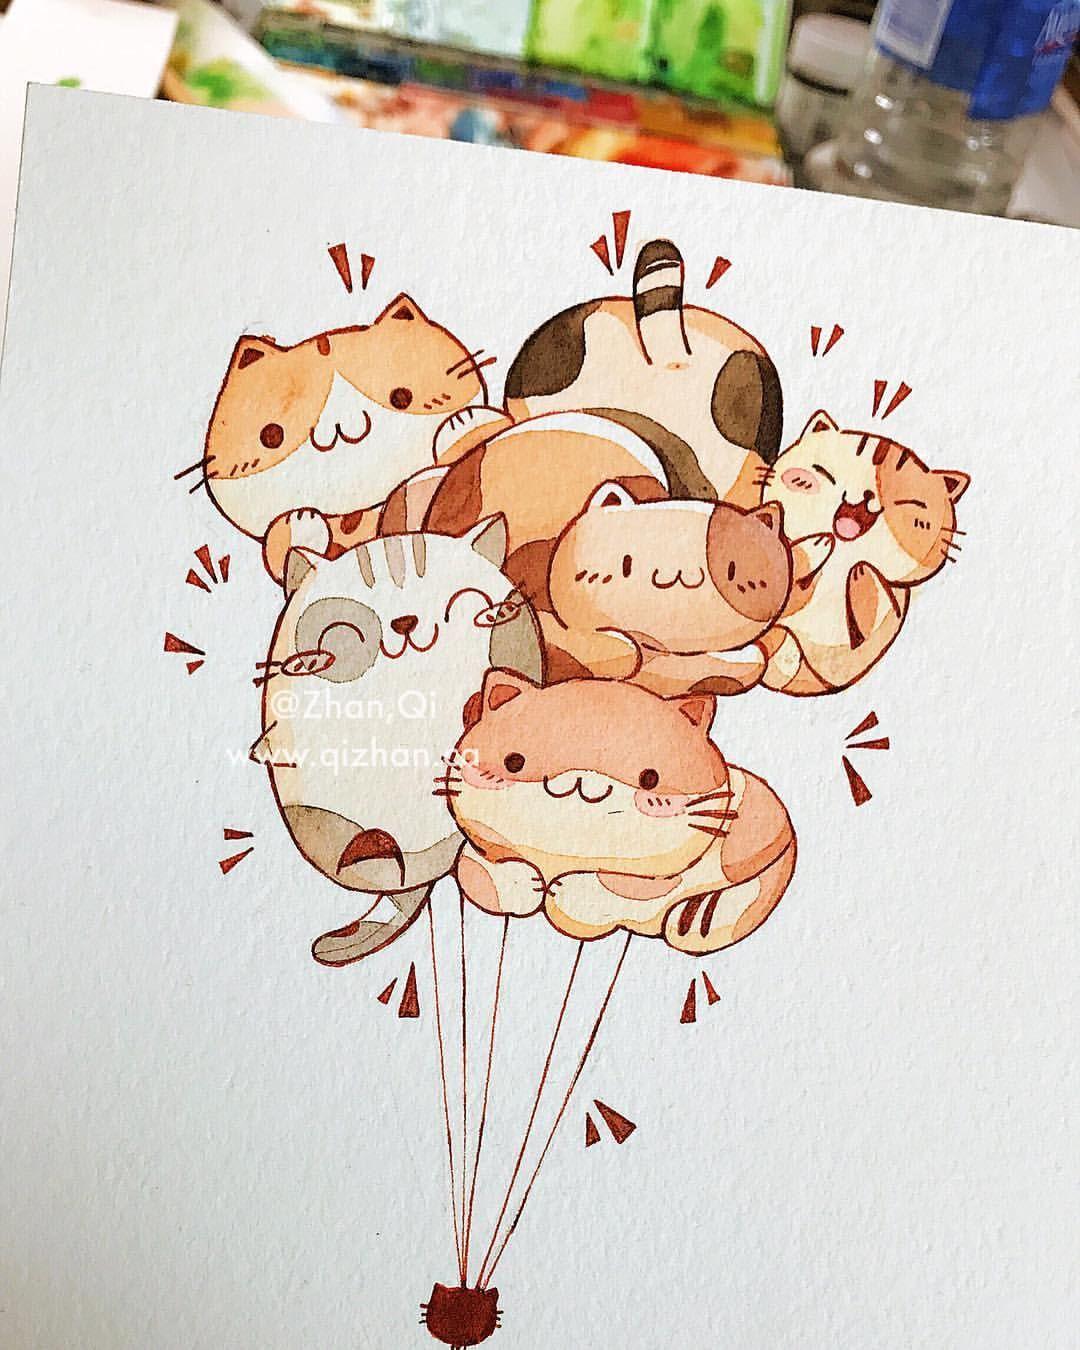 watercolourartist #watercolor #illustration #illustrations #drawing # painting #watercolour #cats | Minh họa động vật, Nhật ký nghệ thuật, Kỳ ảo